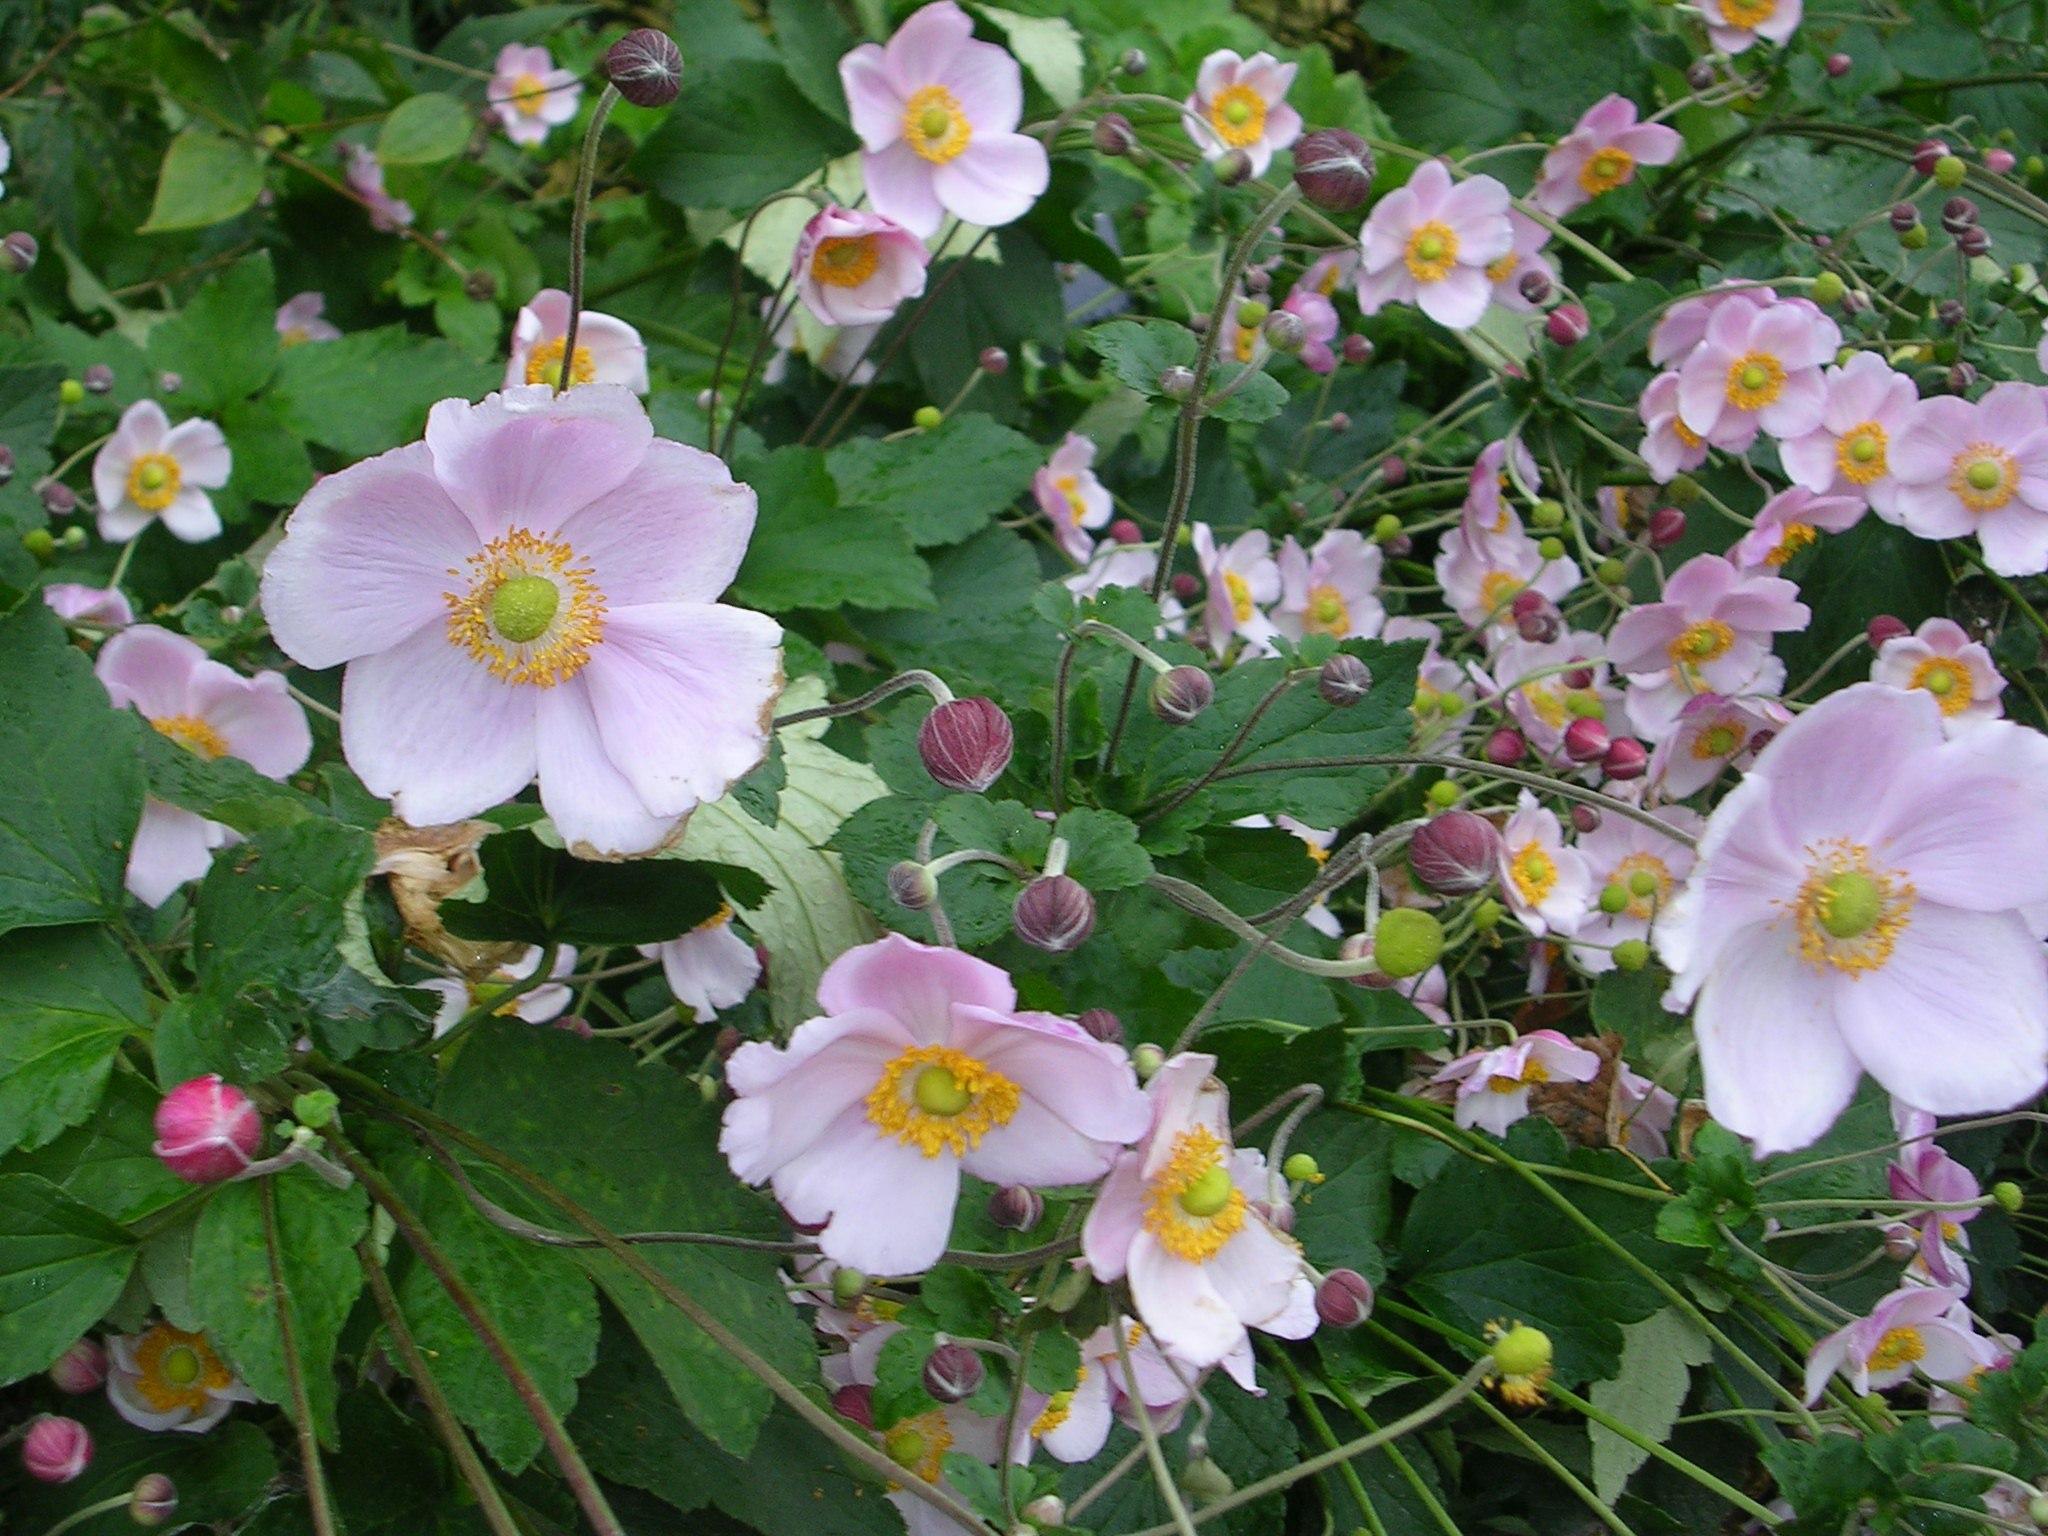 Anemone spp. anemone